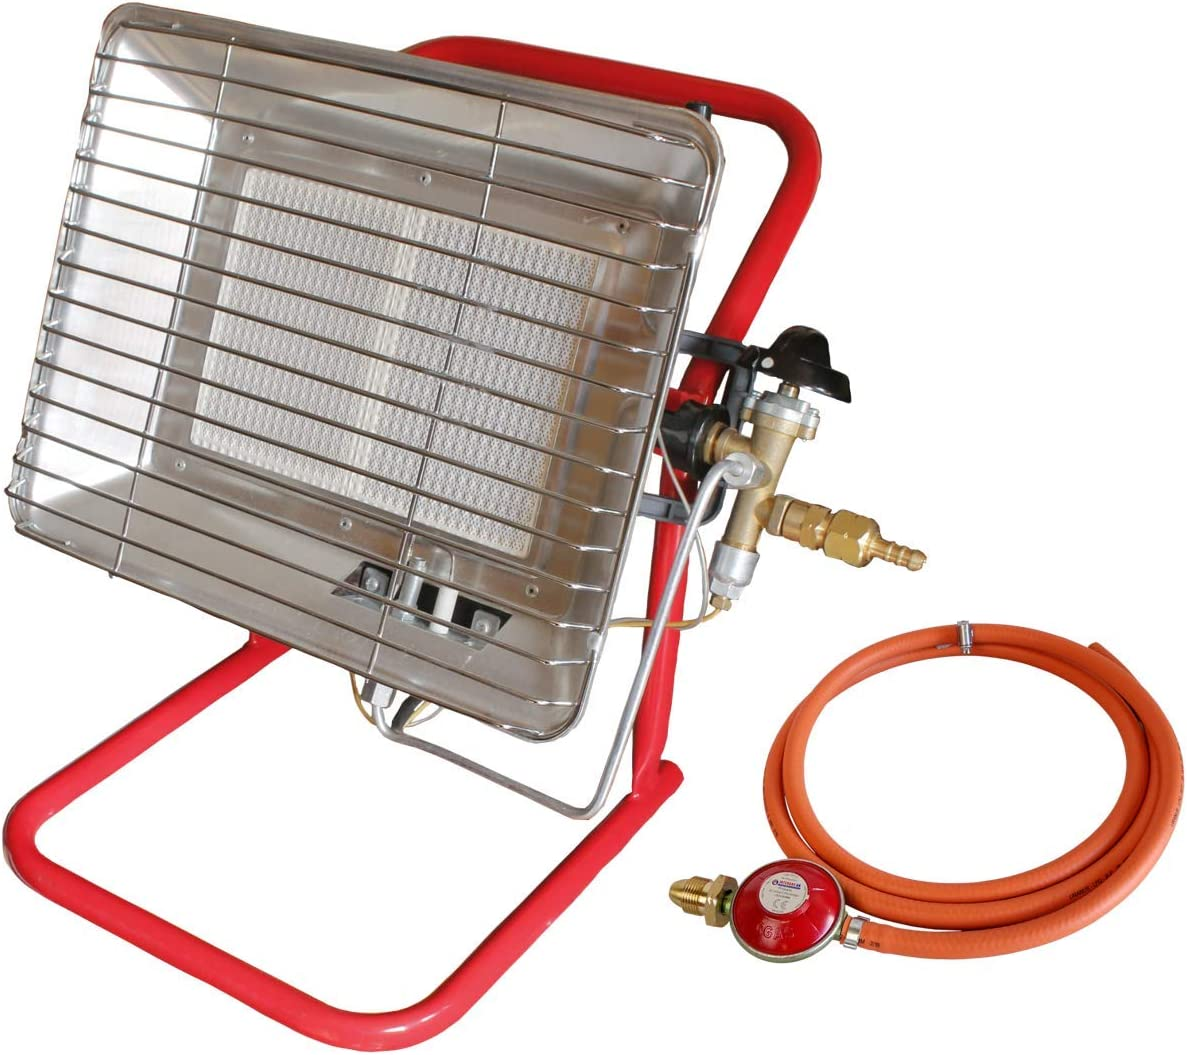 Calentador de gas propano portátil para sitio y taller de encendido por chispa